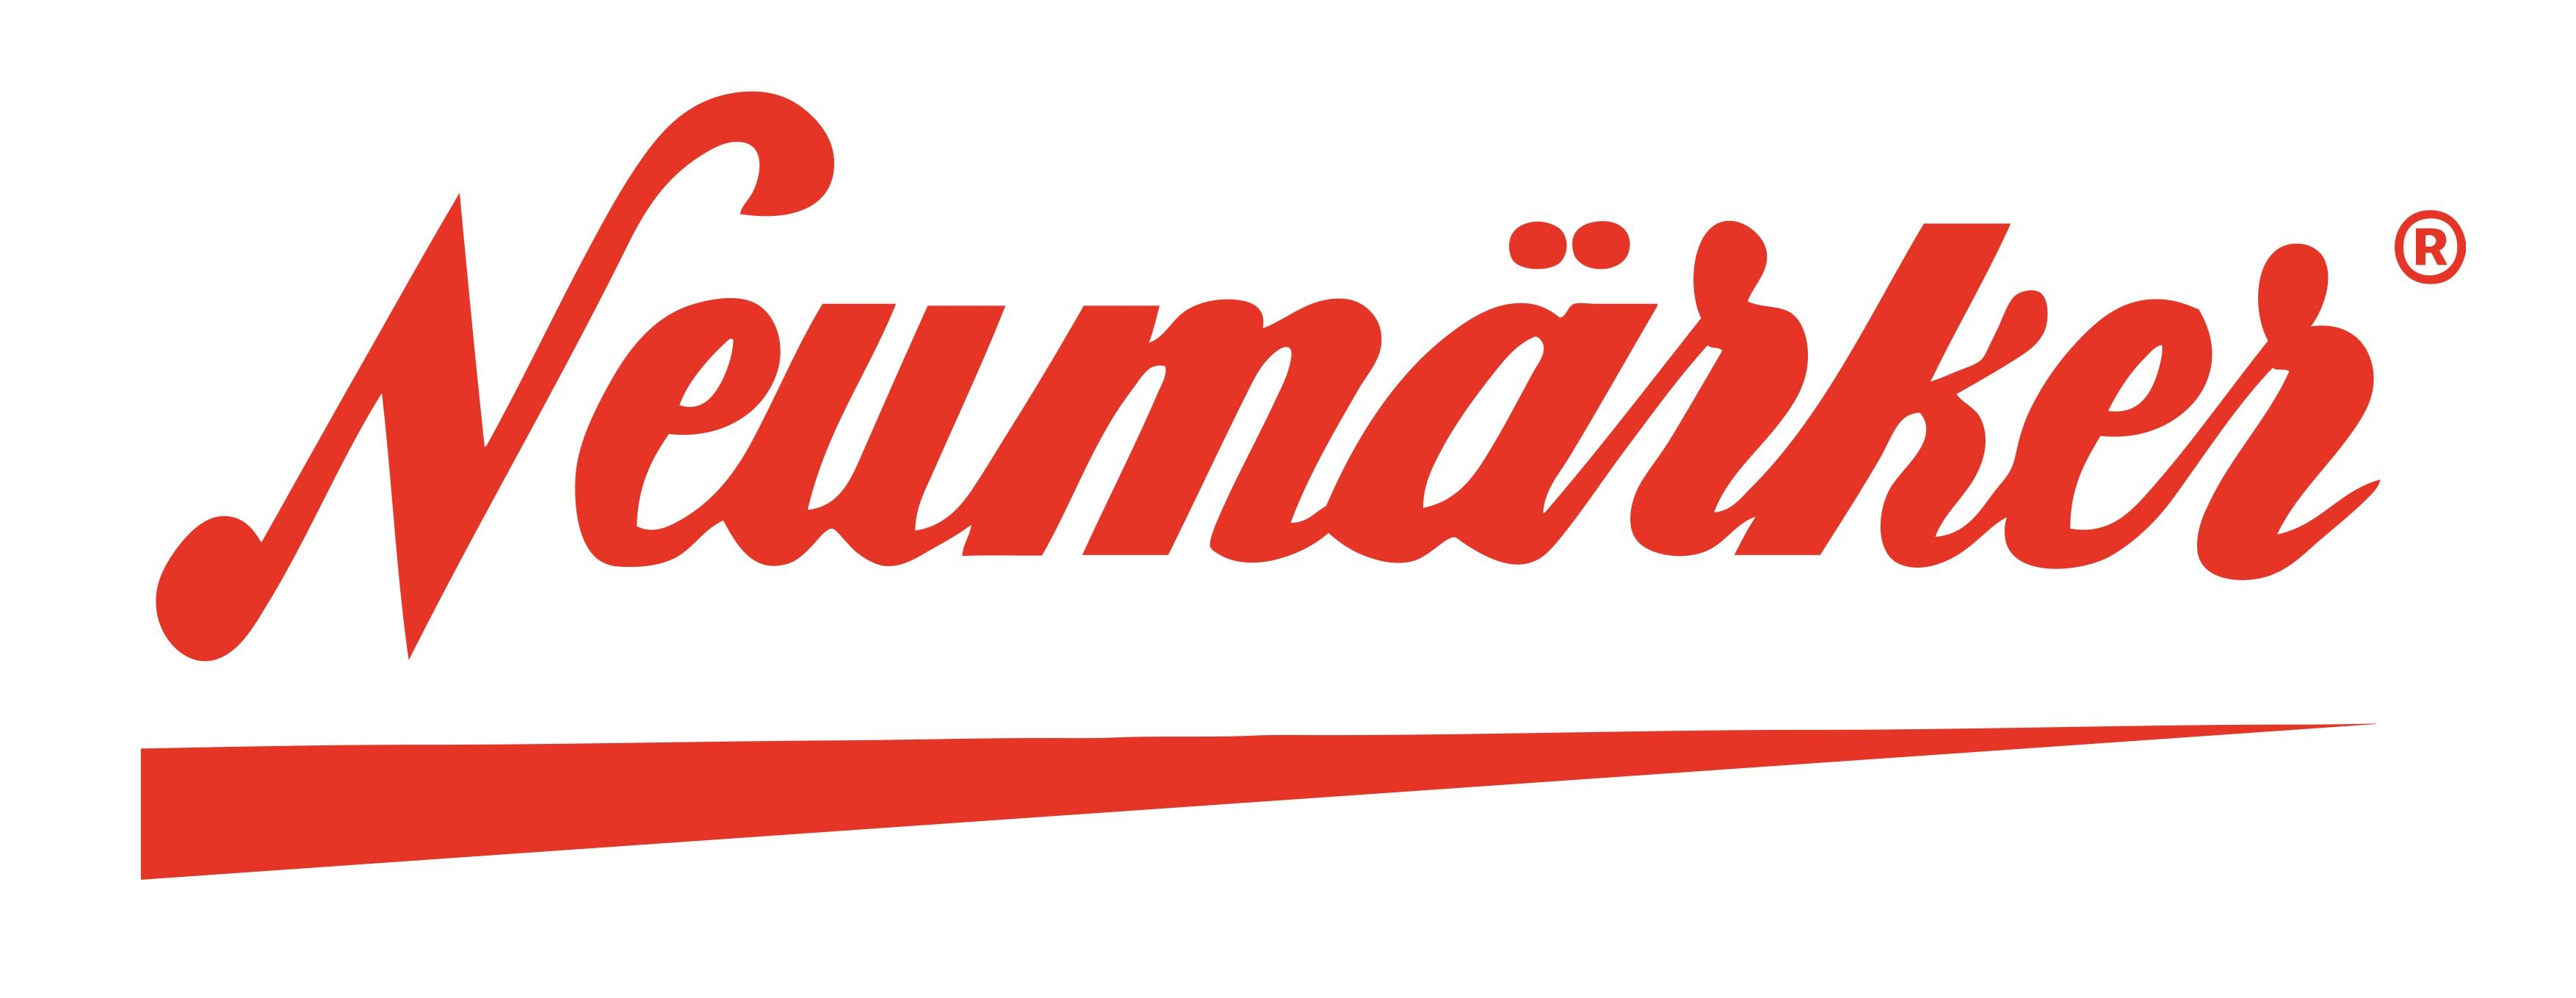 Neumaerker_Logo